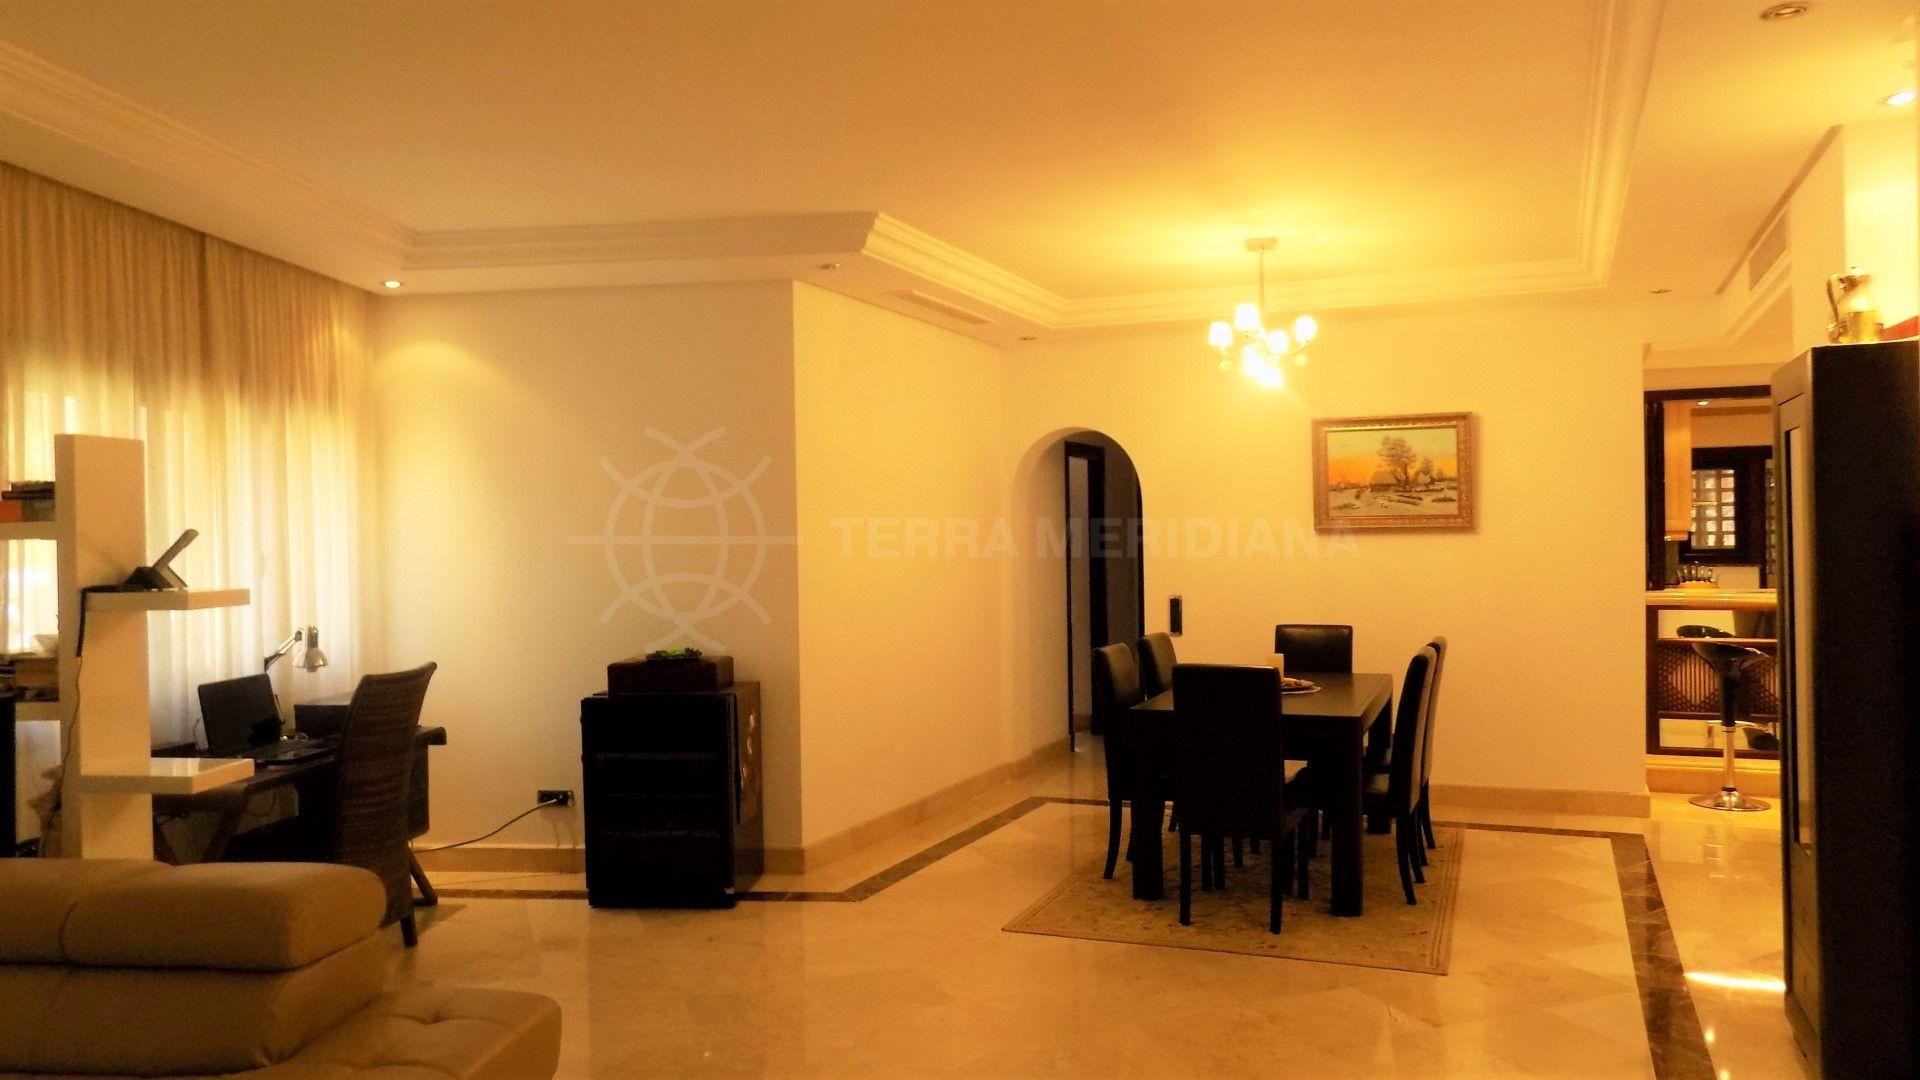 appartement rez de chauss e vendre torre bermeja estepona. Black Bedroom Furniture Sets. Home Design Ideas